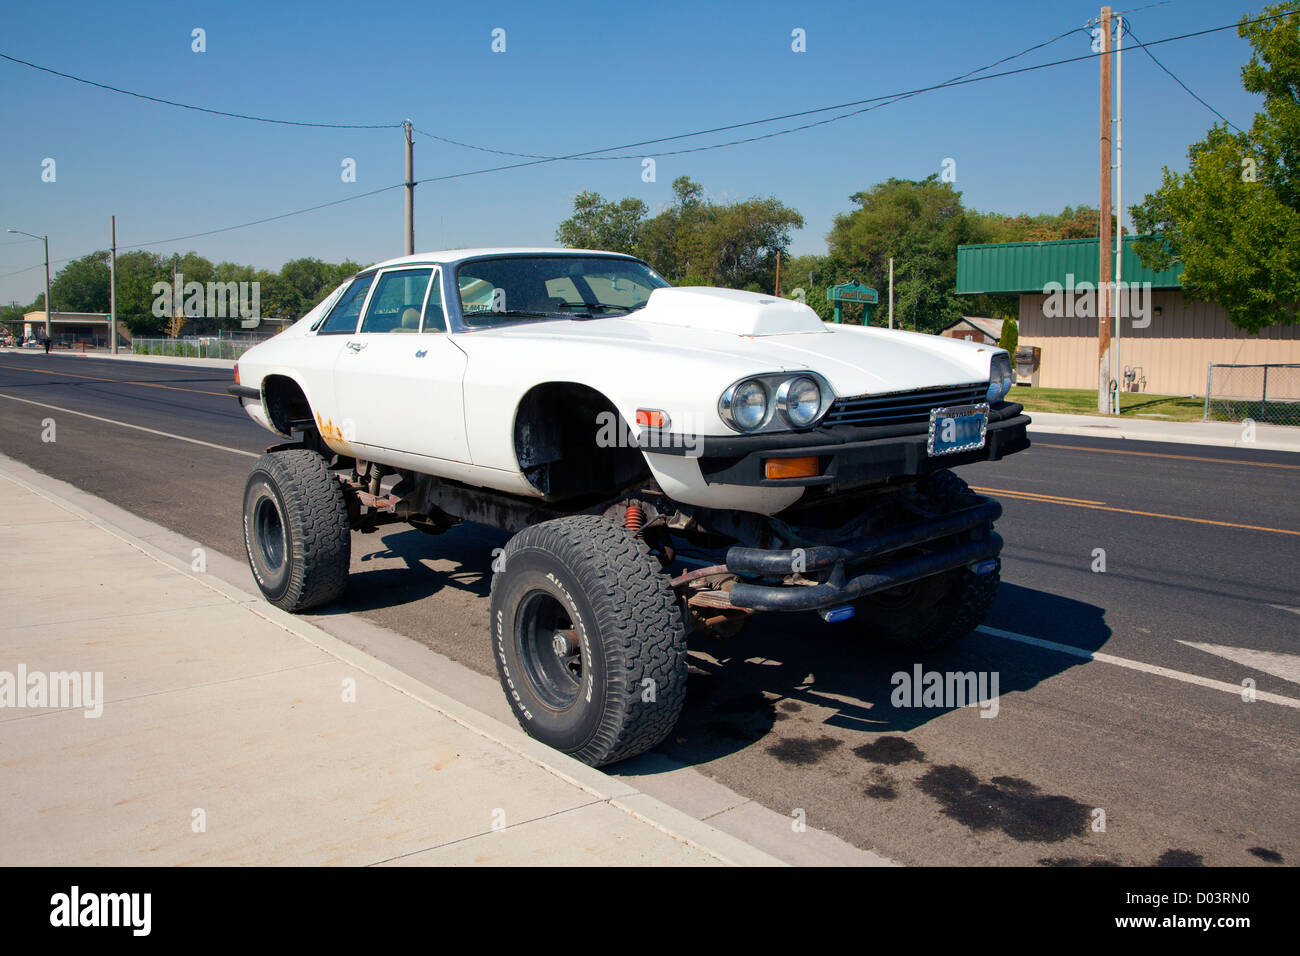 Modified Car Stock Photos Amp Modified Car Stock Images Alamy